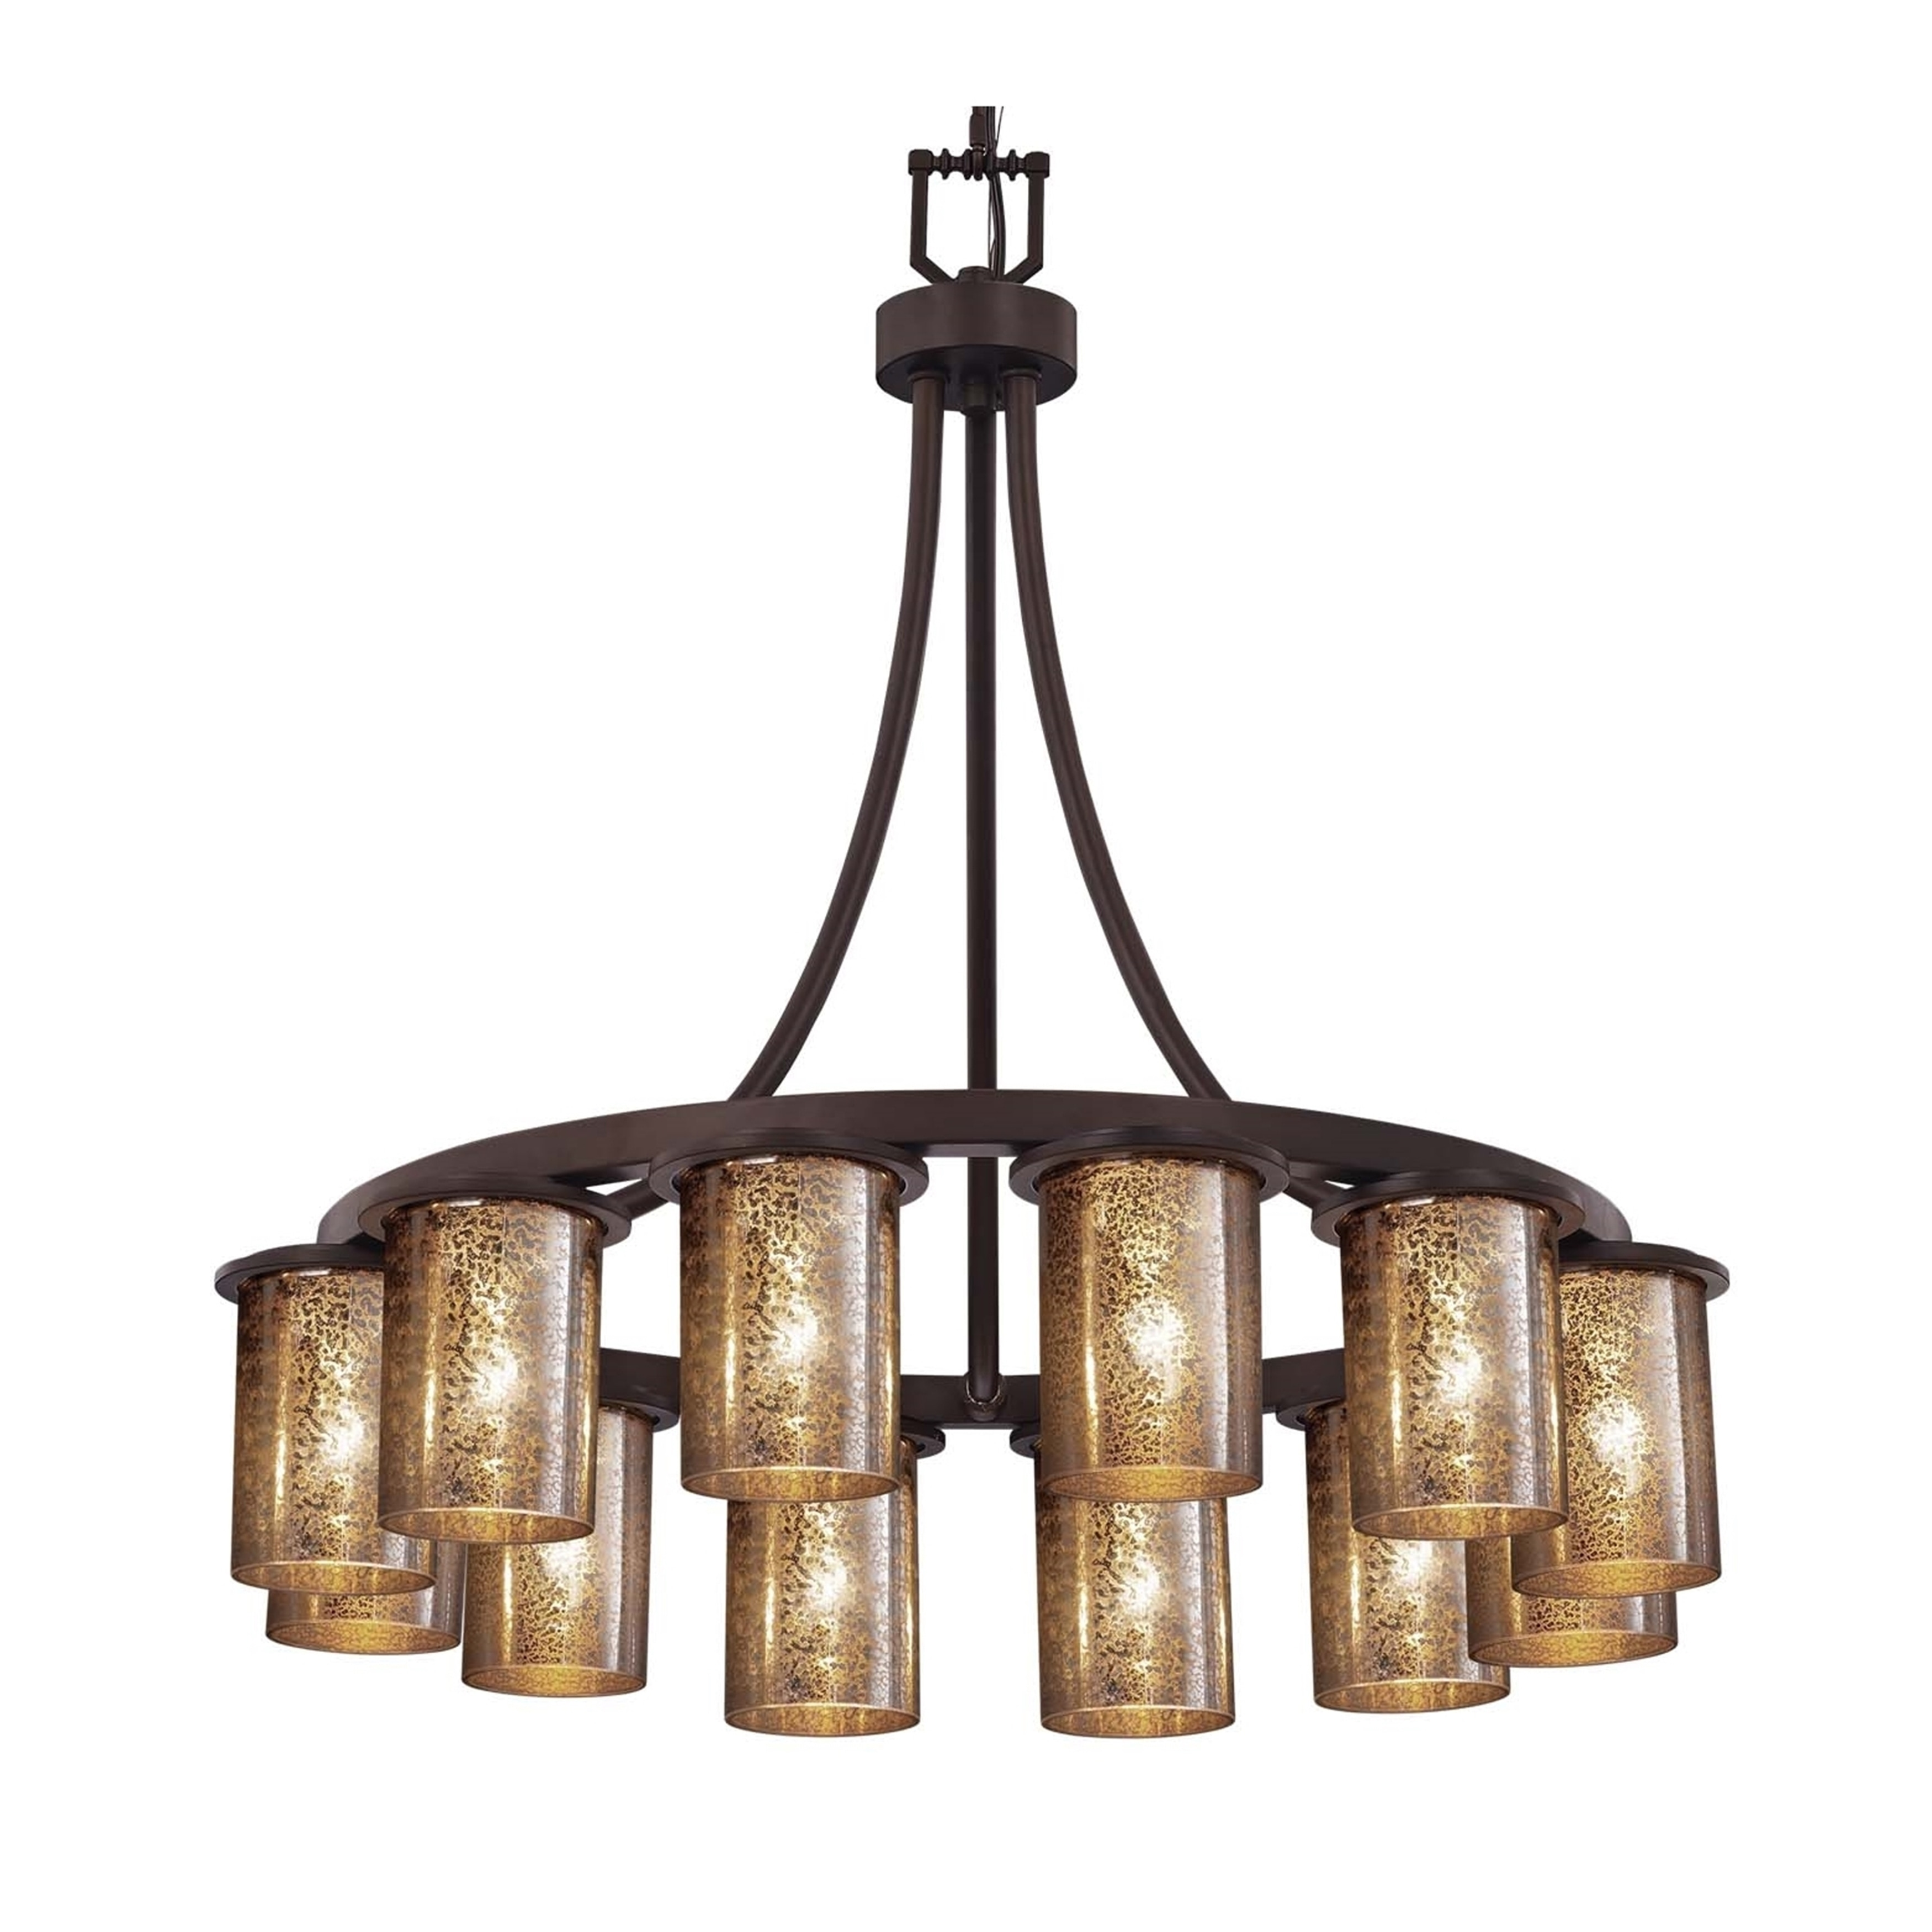 Justice design group fusion dakota 12 light dark bronze downlight chandelier short mercury glass cylinder w flat rim shade